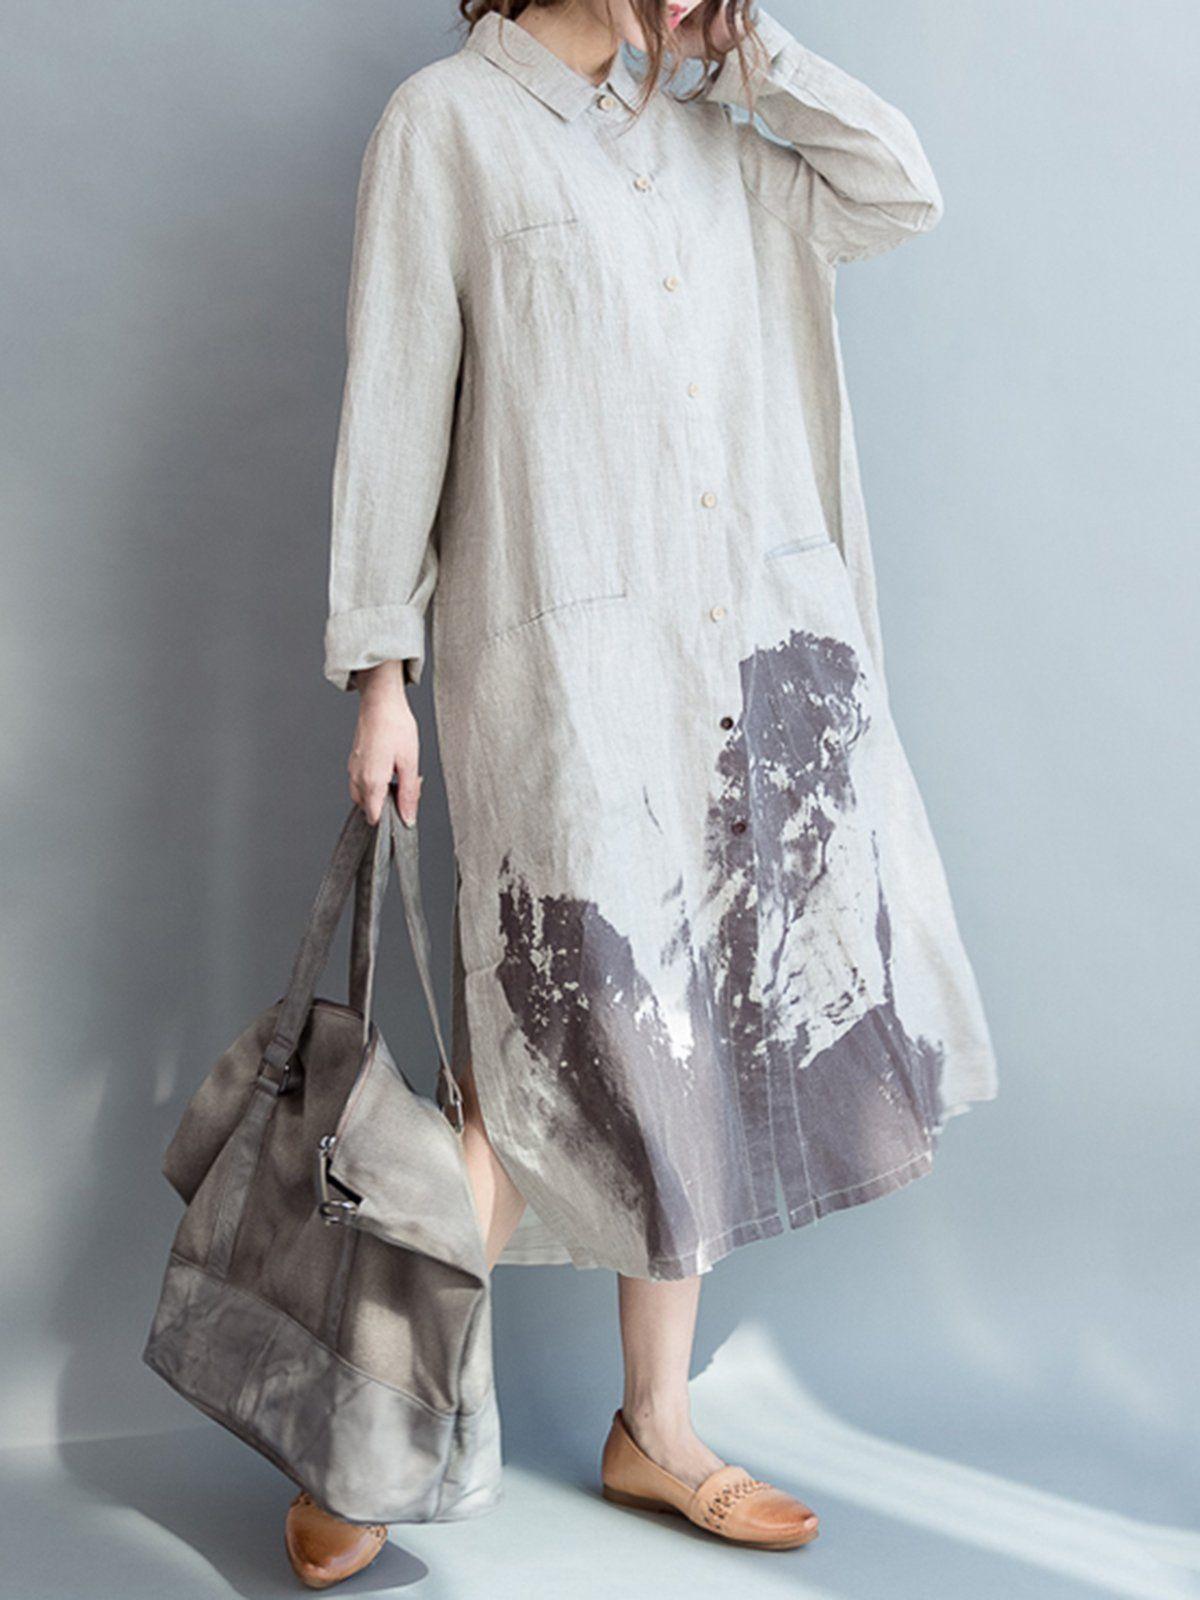 bc4f6b4cce Long sleeve cotton plus size dress – noracora – Artofit